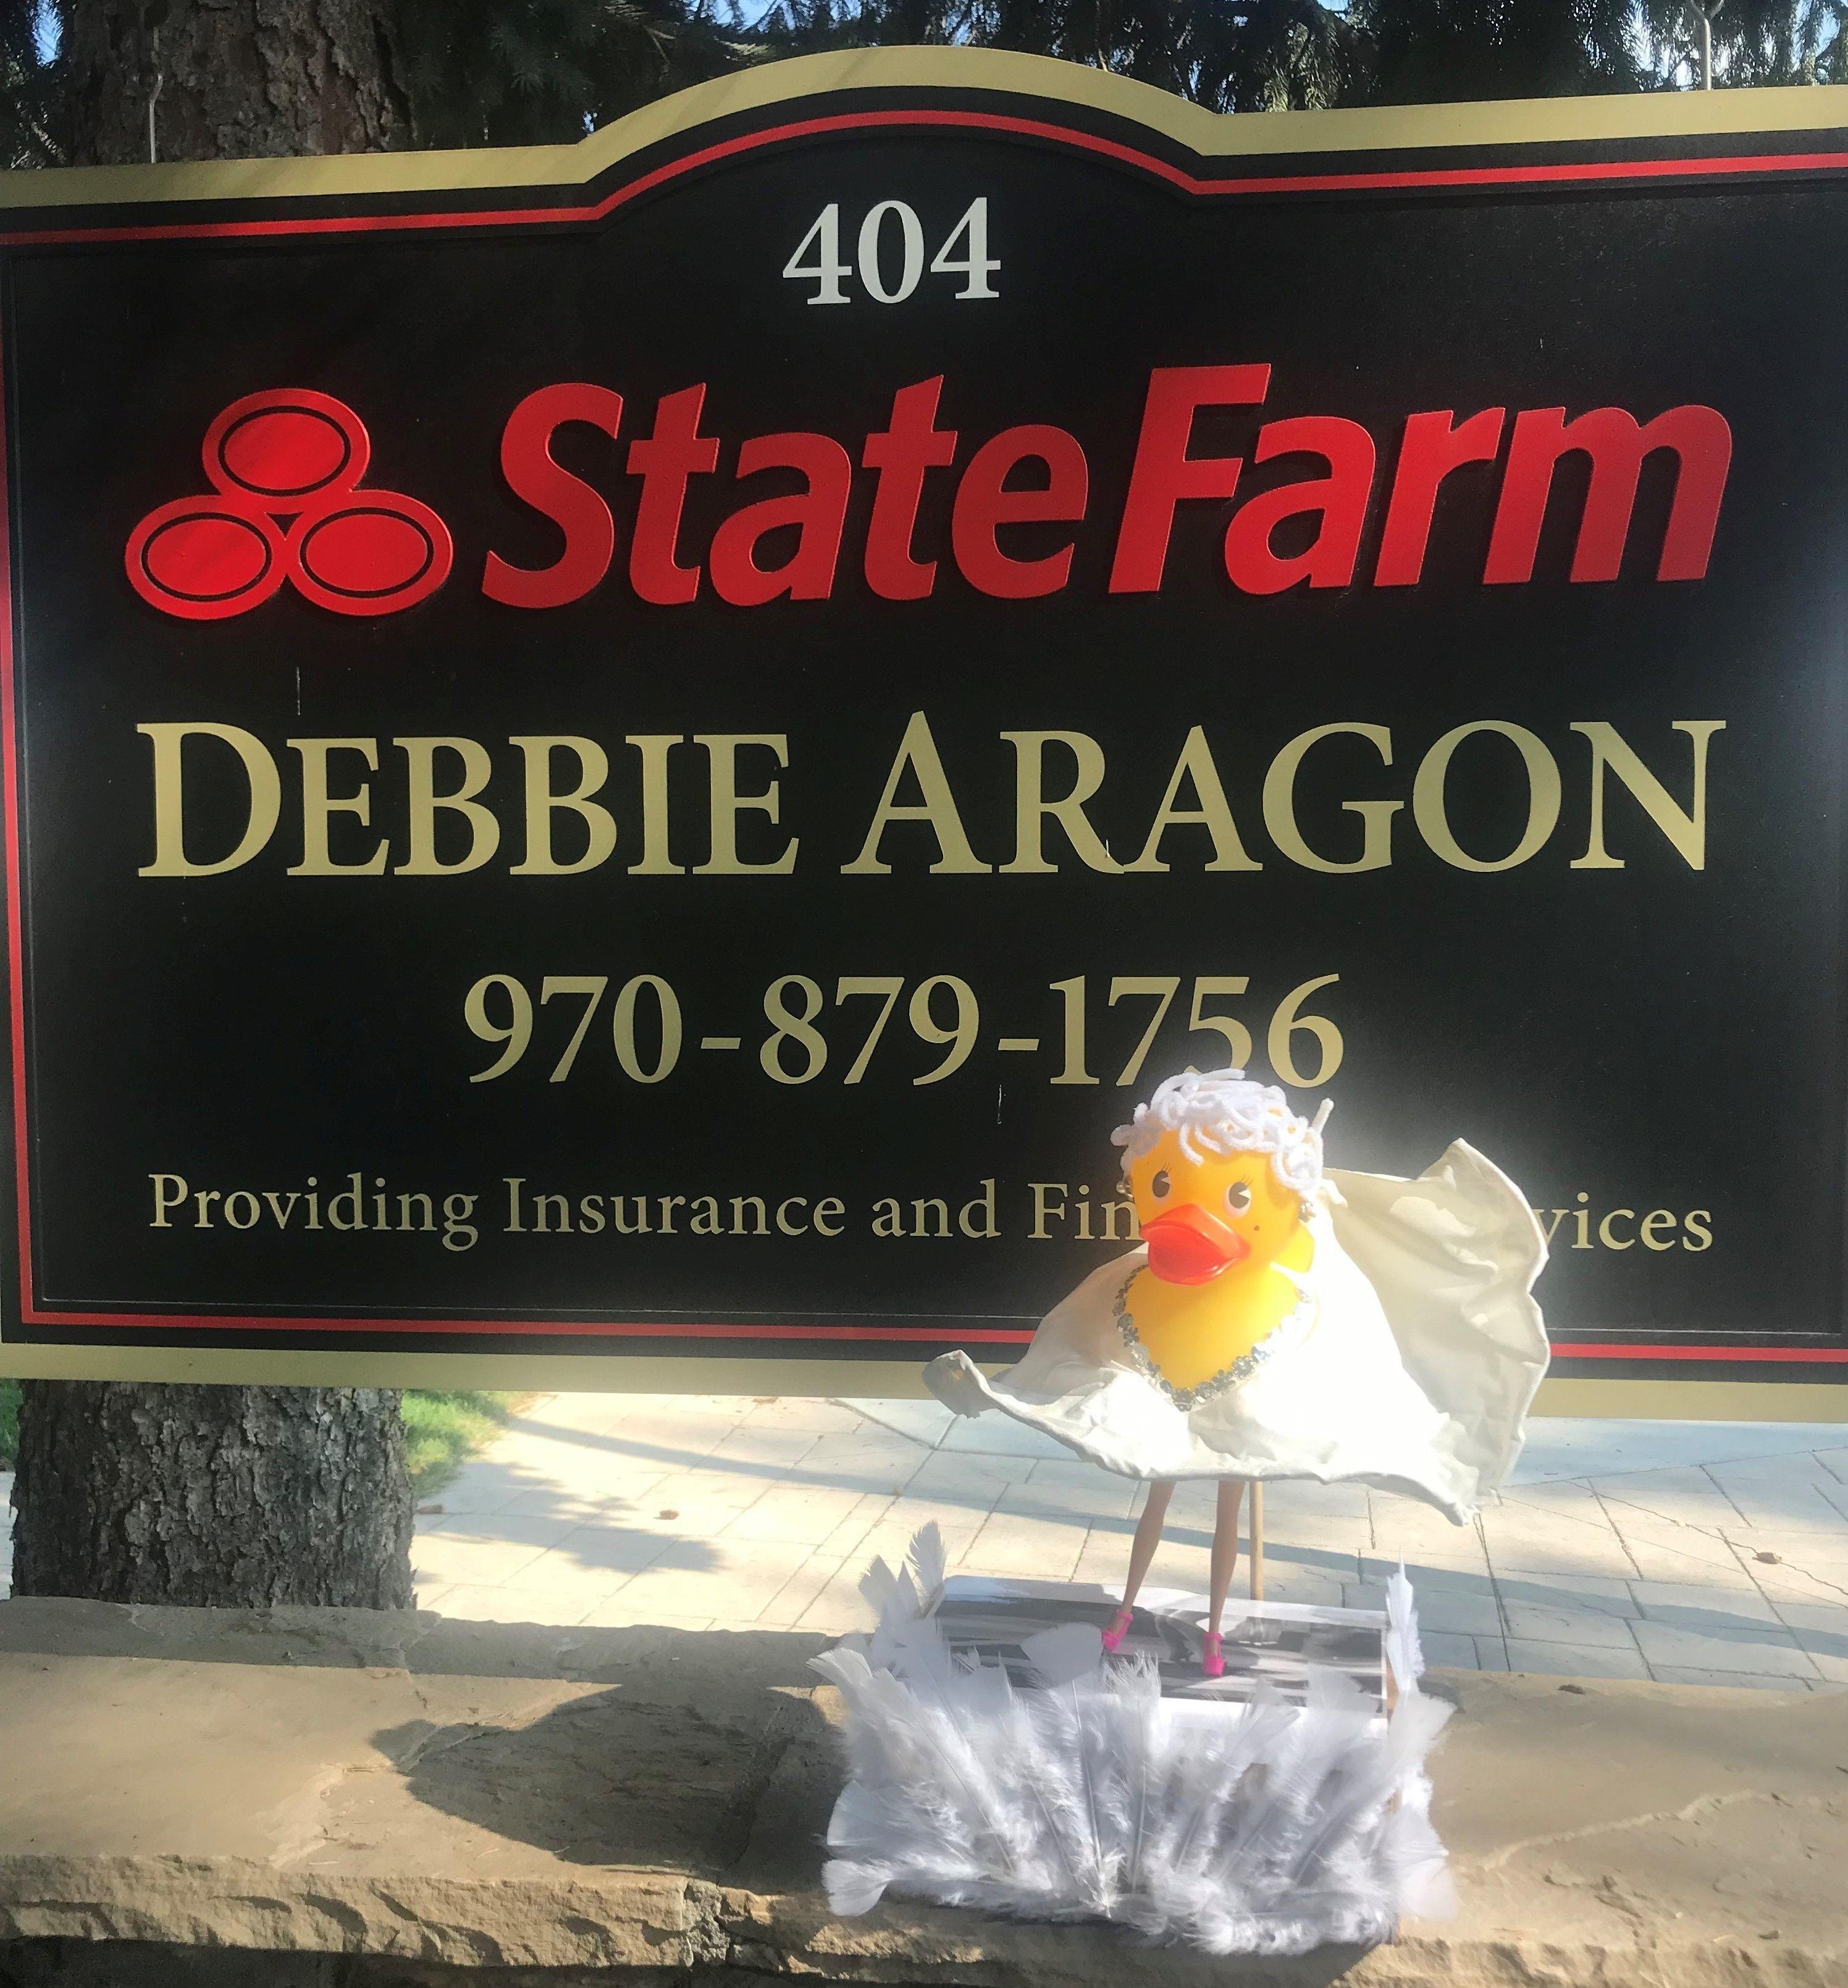 State Farm Insurance - Deborah Aragon